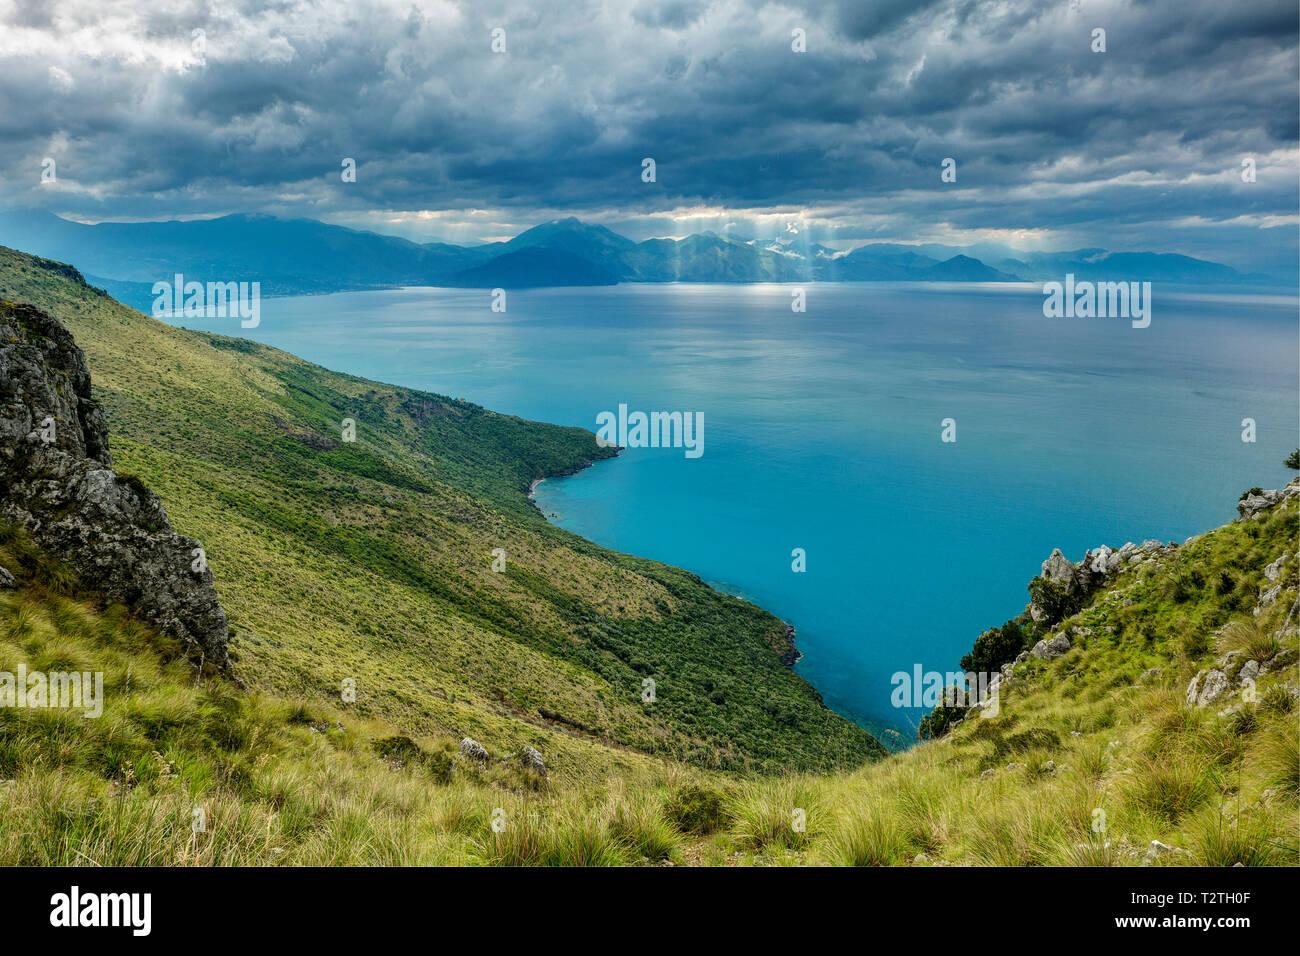 Italy, Campania, Cilento National Park,  Masseta and Infreschi Marine protected area, Policastro Gulf - Stock Image